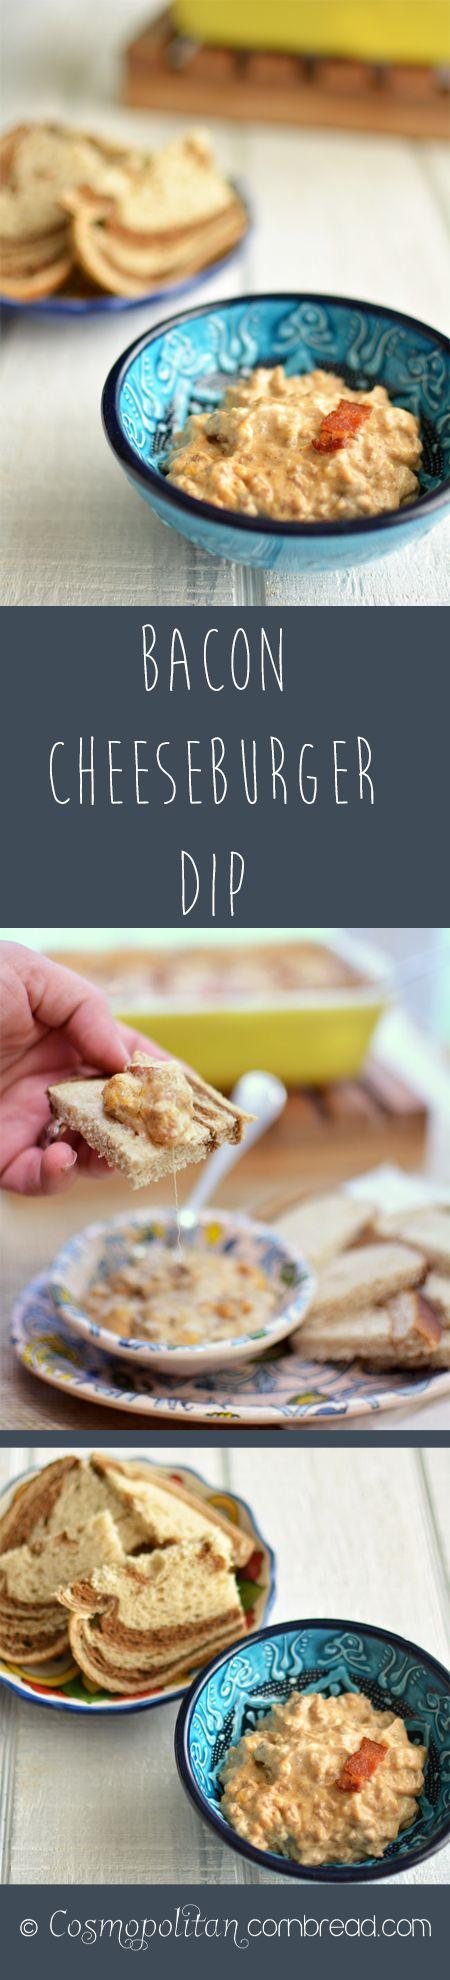 Bacon Cheeseburger Dip from Cosmopolitan Cornbread | #SundaySupper Appetizer